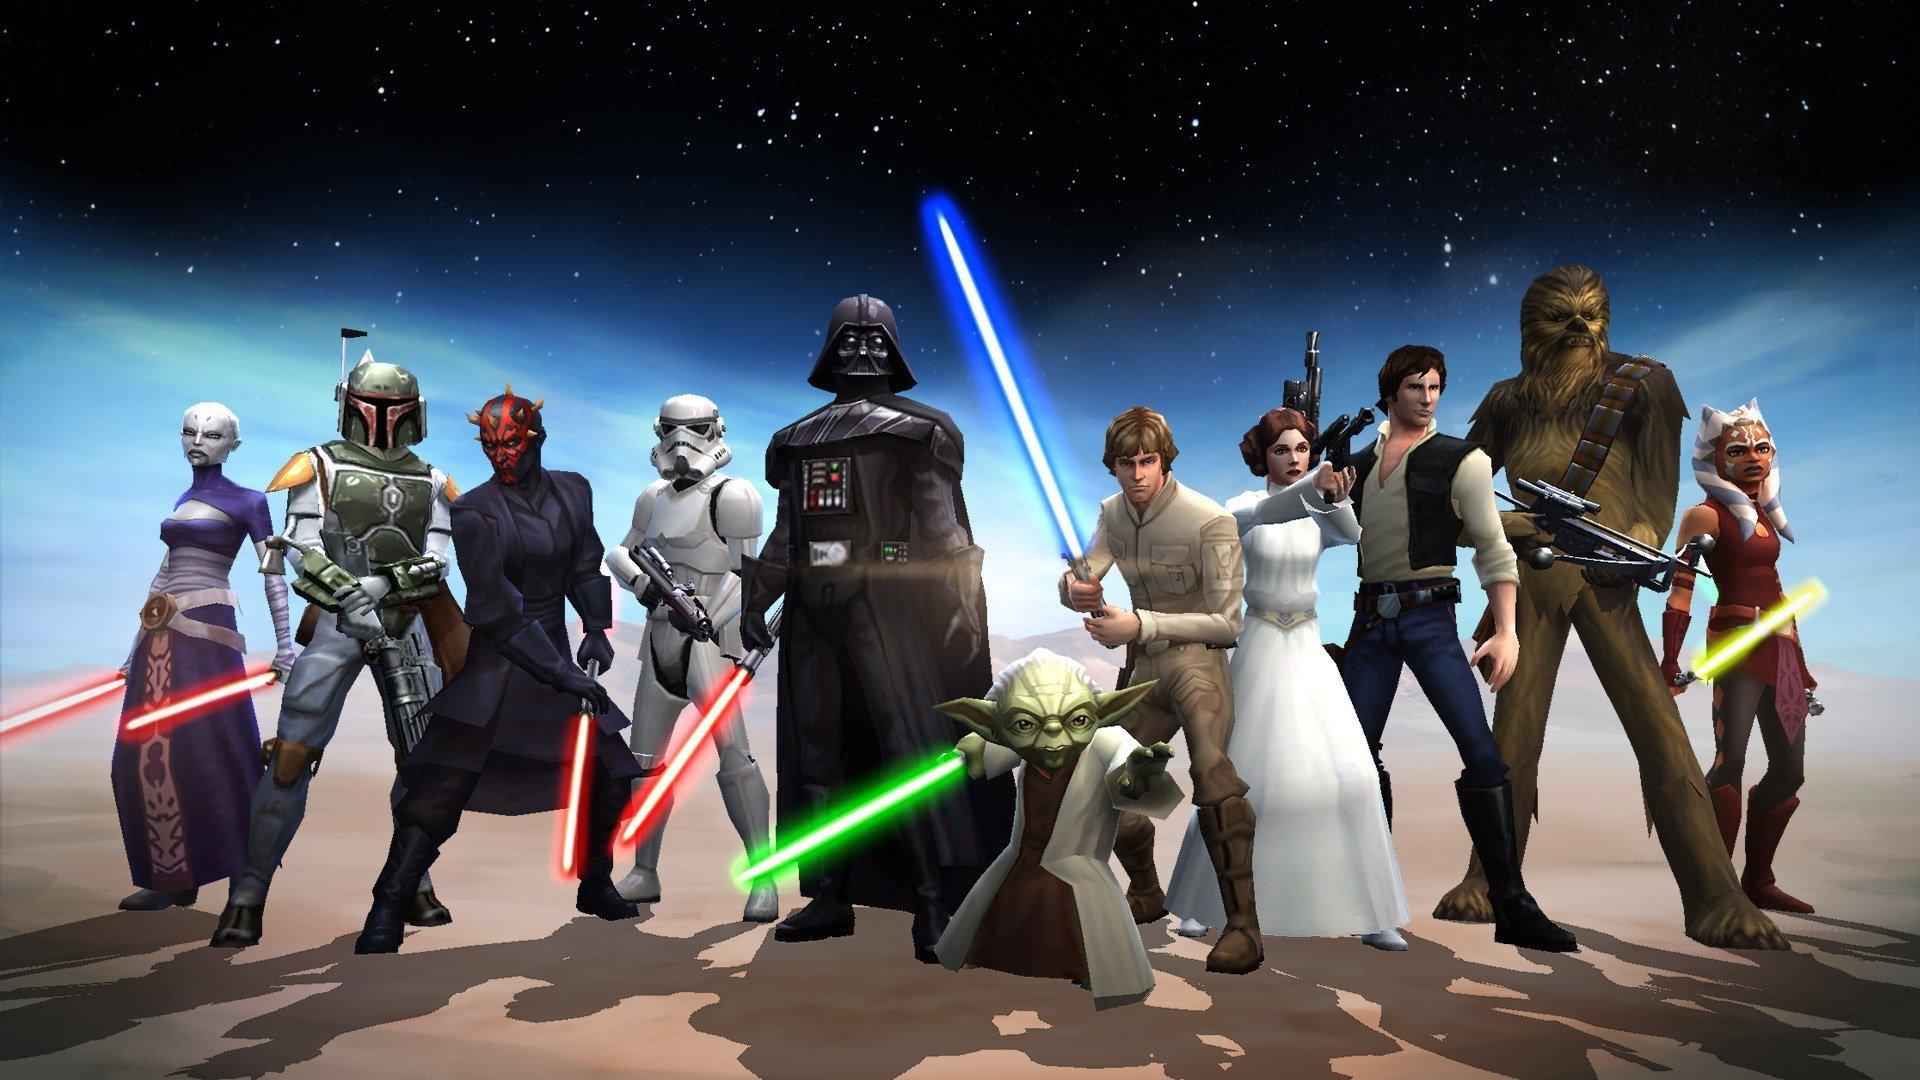 Video Game - Star Wars: Galaxy of Heroes  Star Wars Boba Fett Darth Maul Stormtrooper Darth Vader Yoda Luke Skywalker Han Solo Princess Leia Chewbacca Ahsoka Tano Asajj Ventress Wallpaper